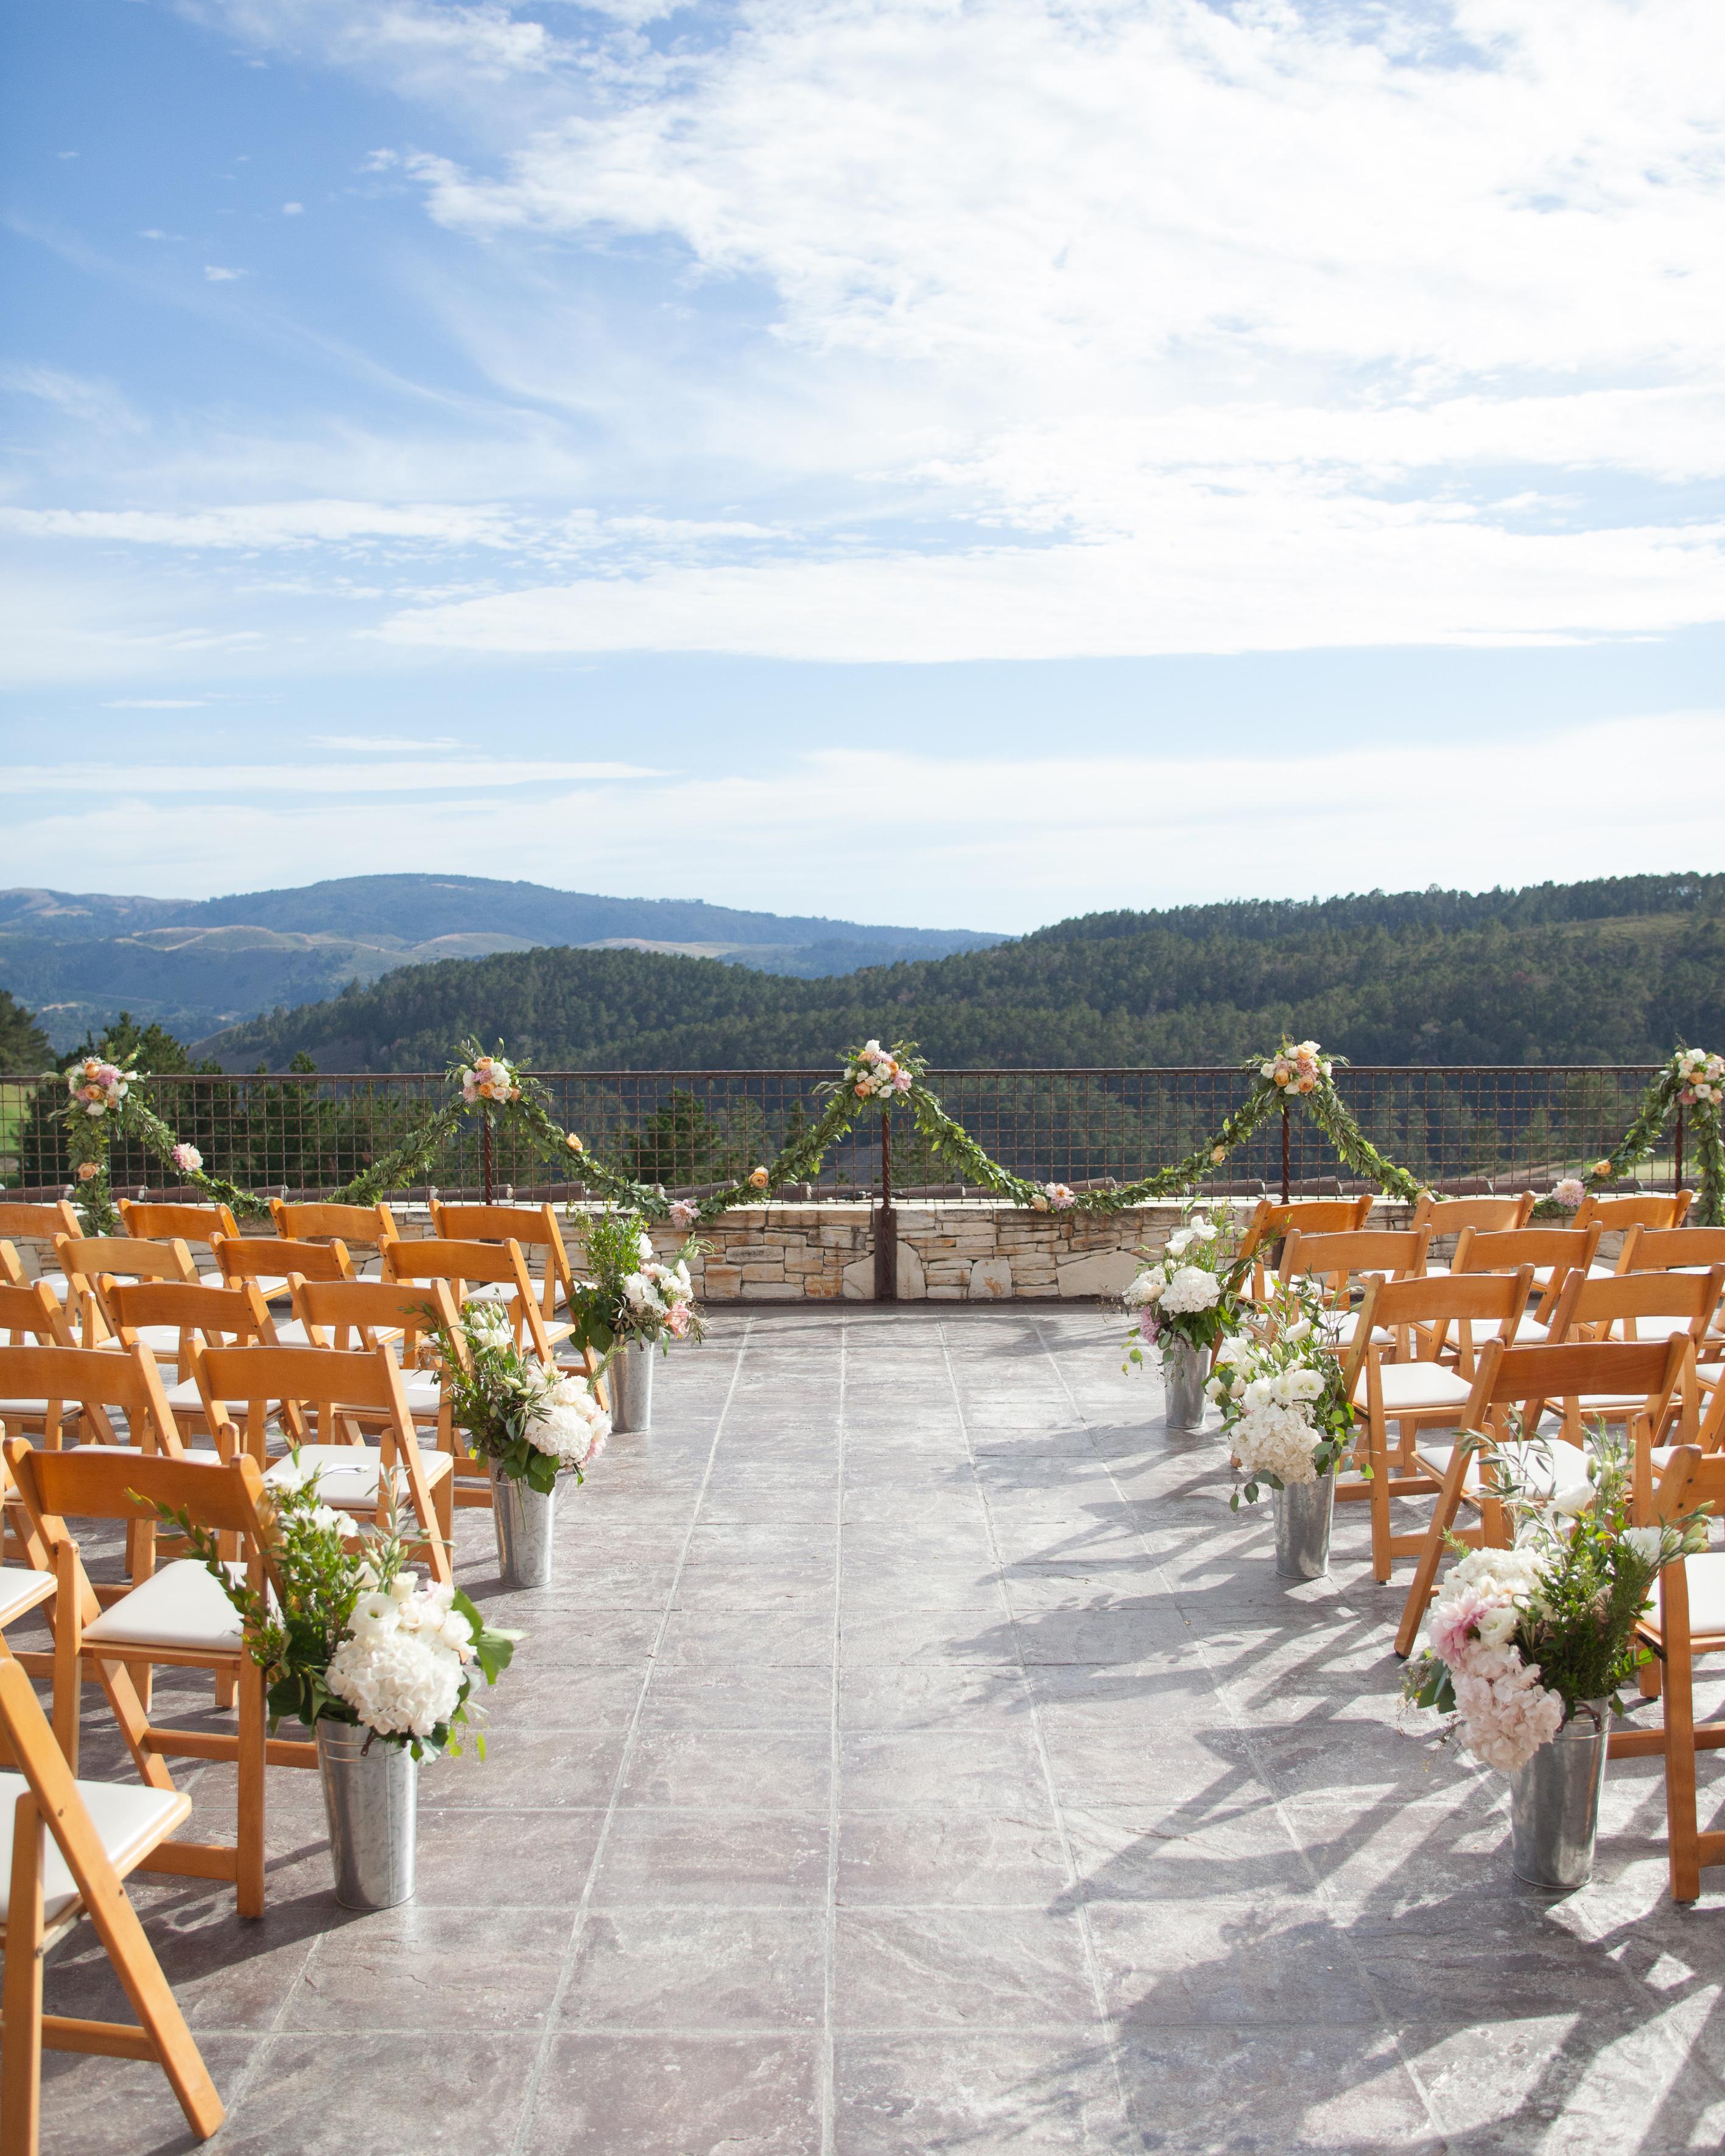 kristin-chris-wedding-ceremonyspot-206-s112398-0116.jpg